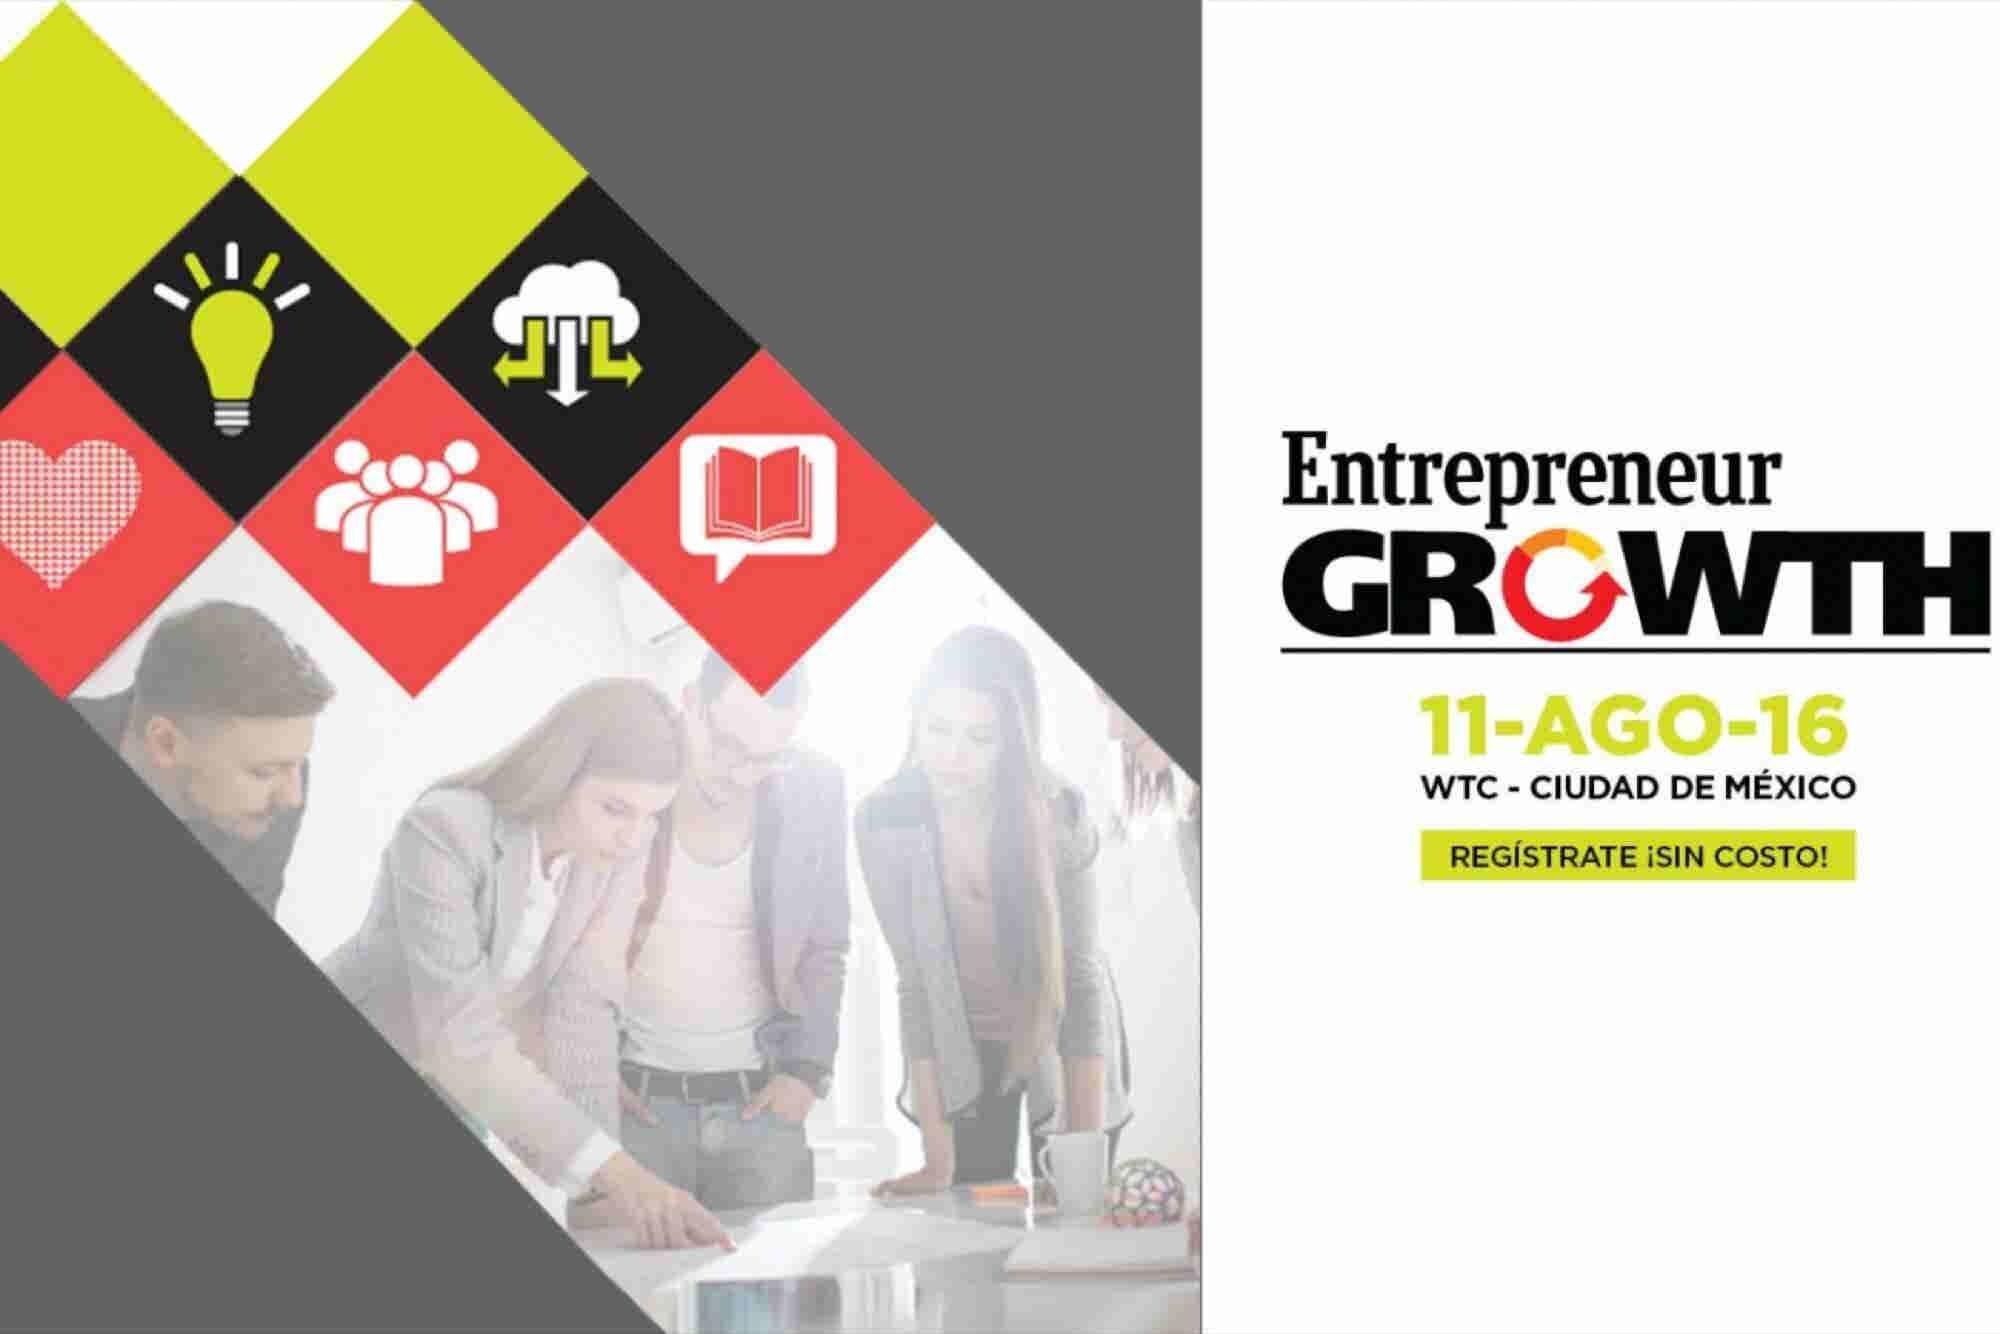 ¡Mañana llega Entrepreneur Growth 2016!